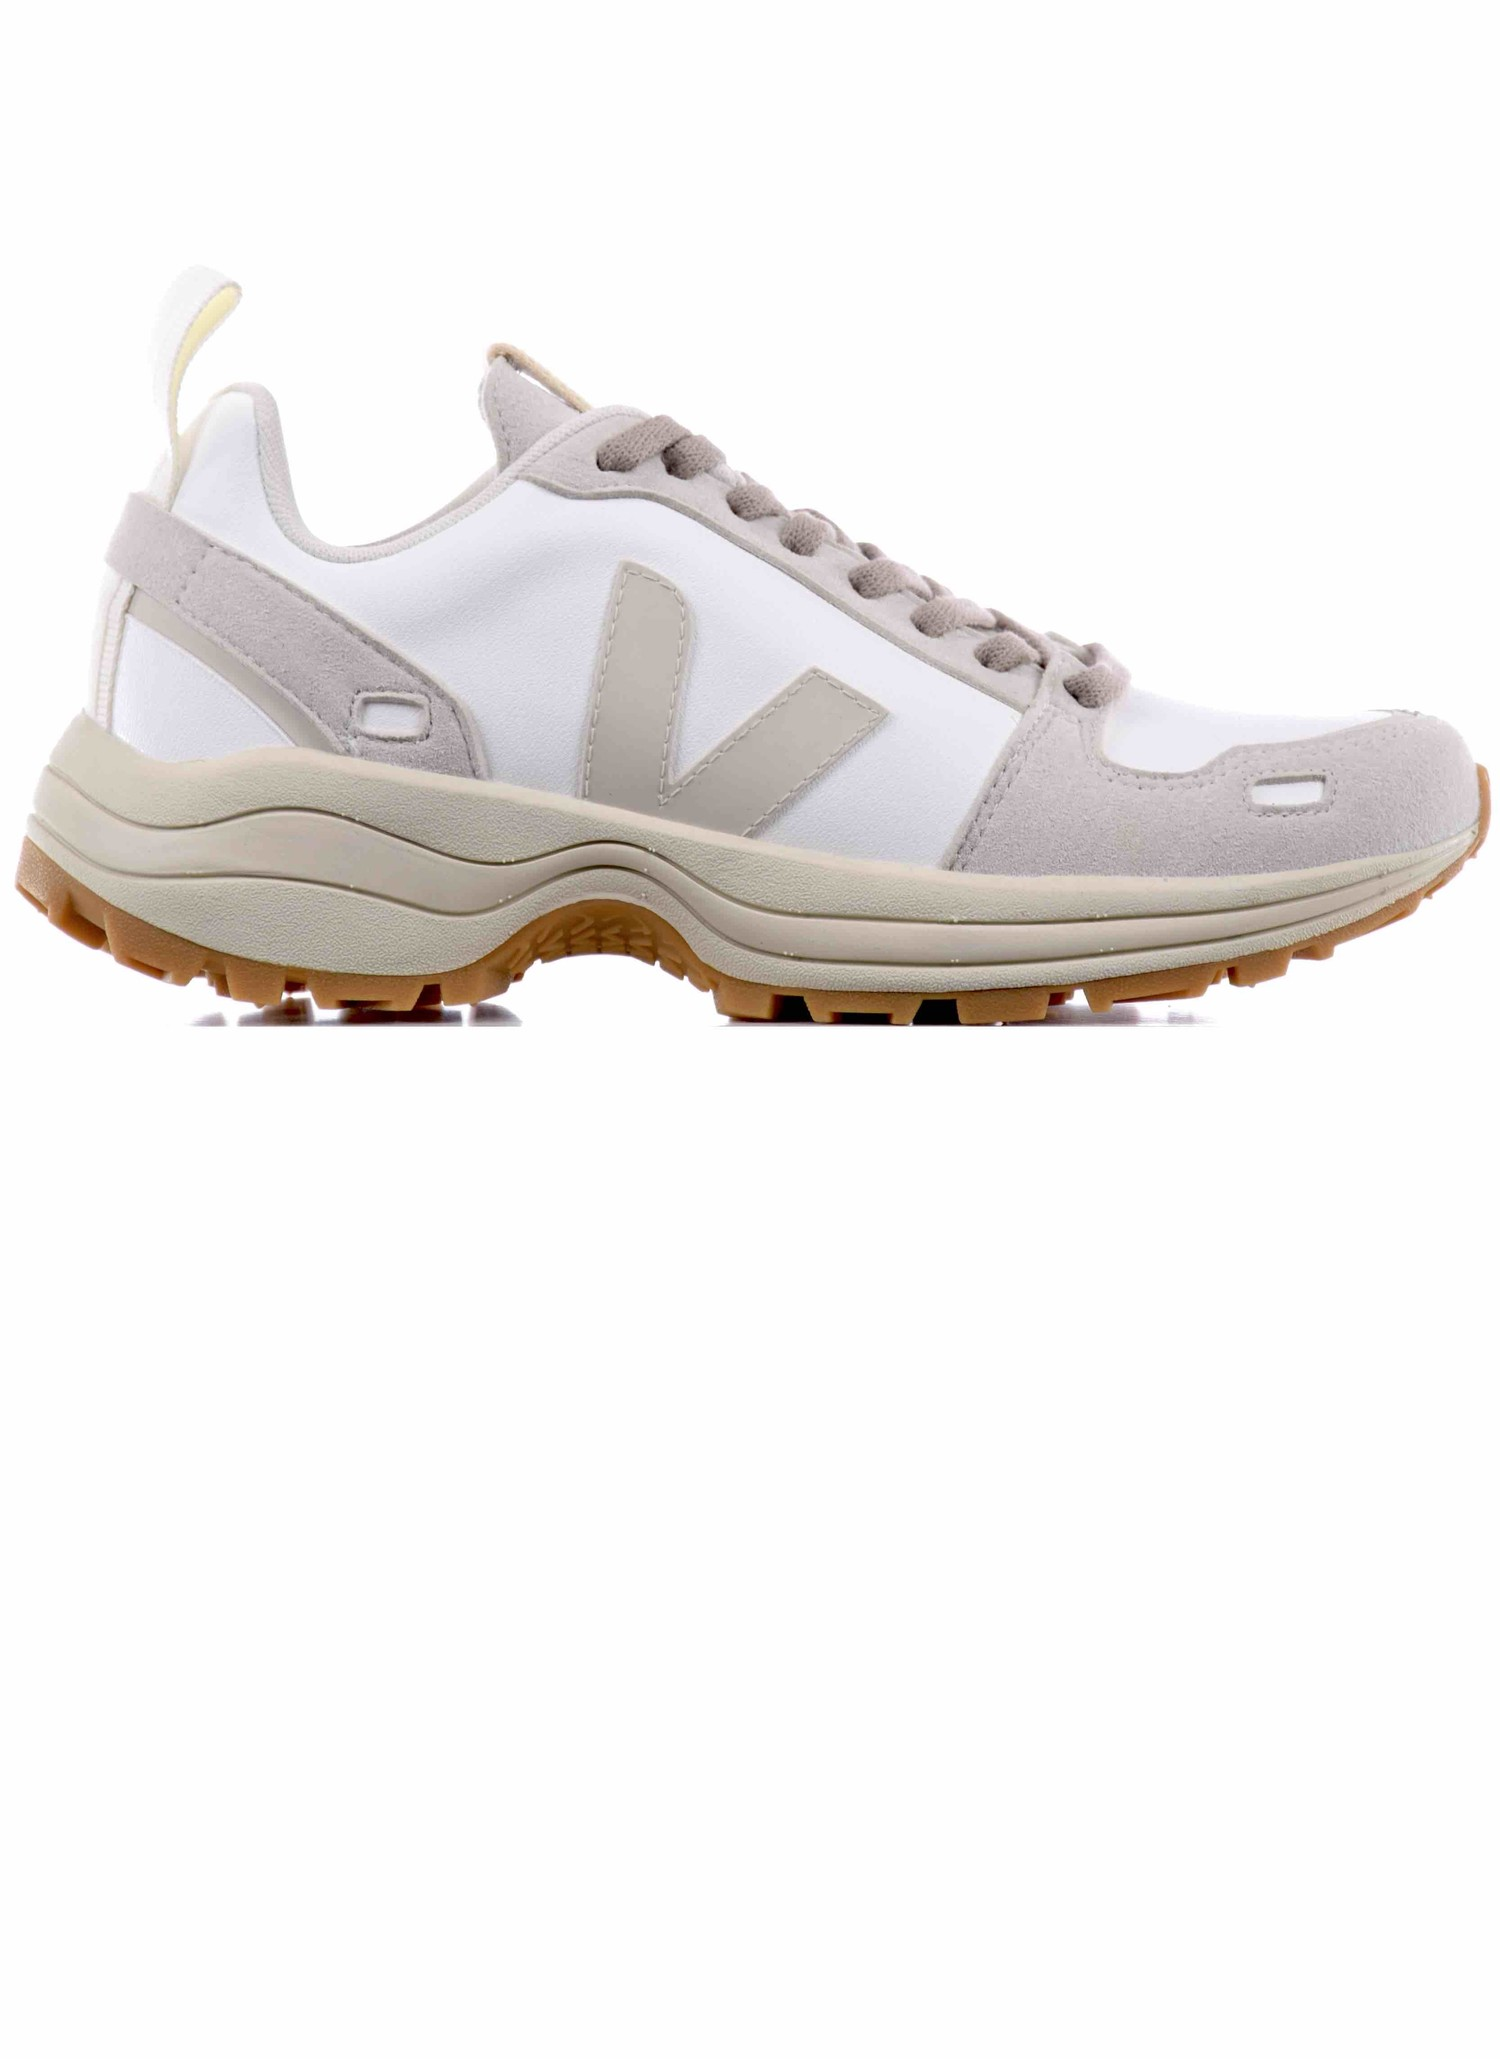 tubo respirador asentamiento Charlotte Bronte  Rick Owens x Veja Hiking Sneakers Beige | HALO - HALO